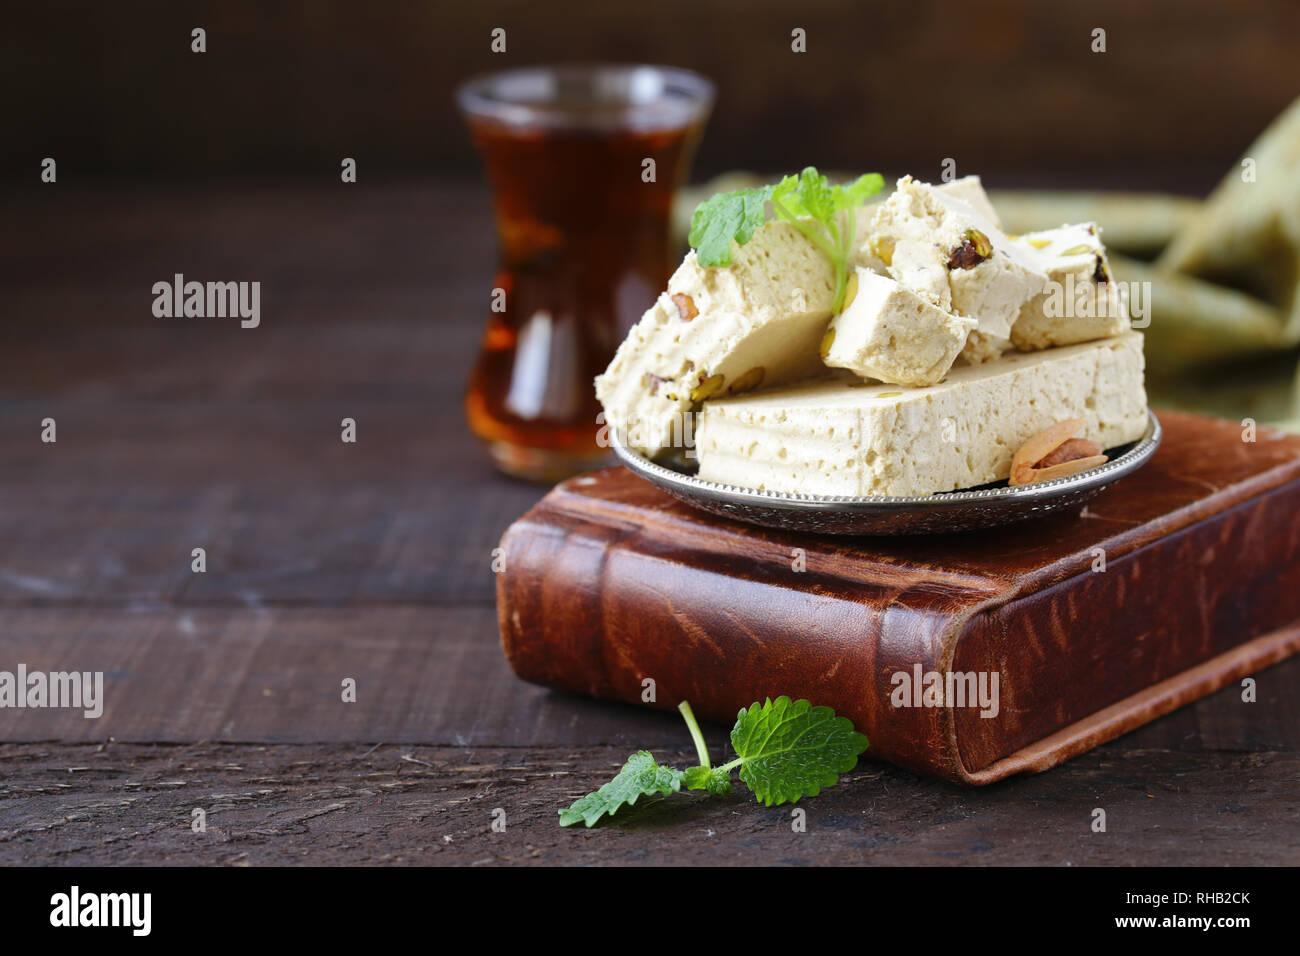 Oriental sweets - halva with pistachios - Stock Image